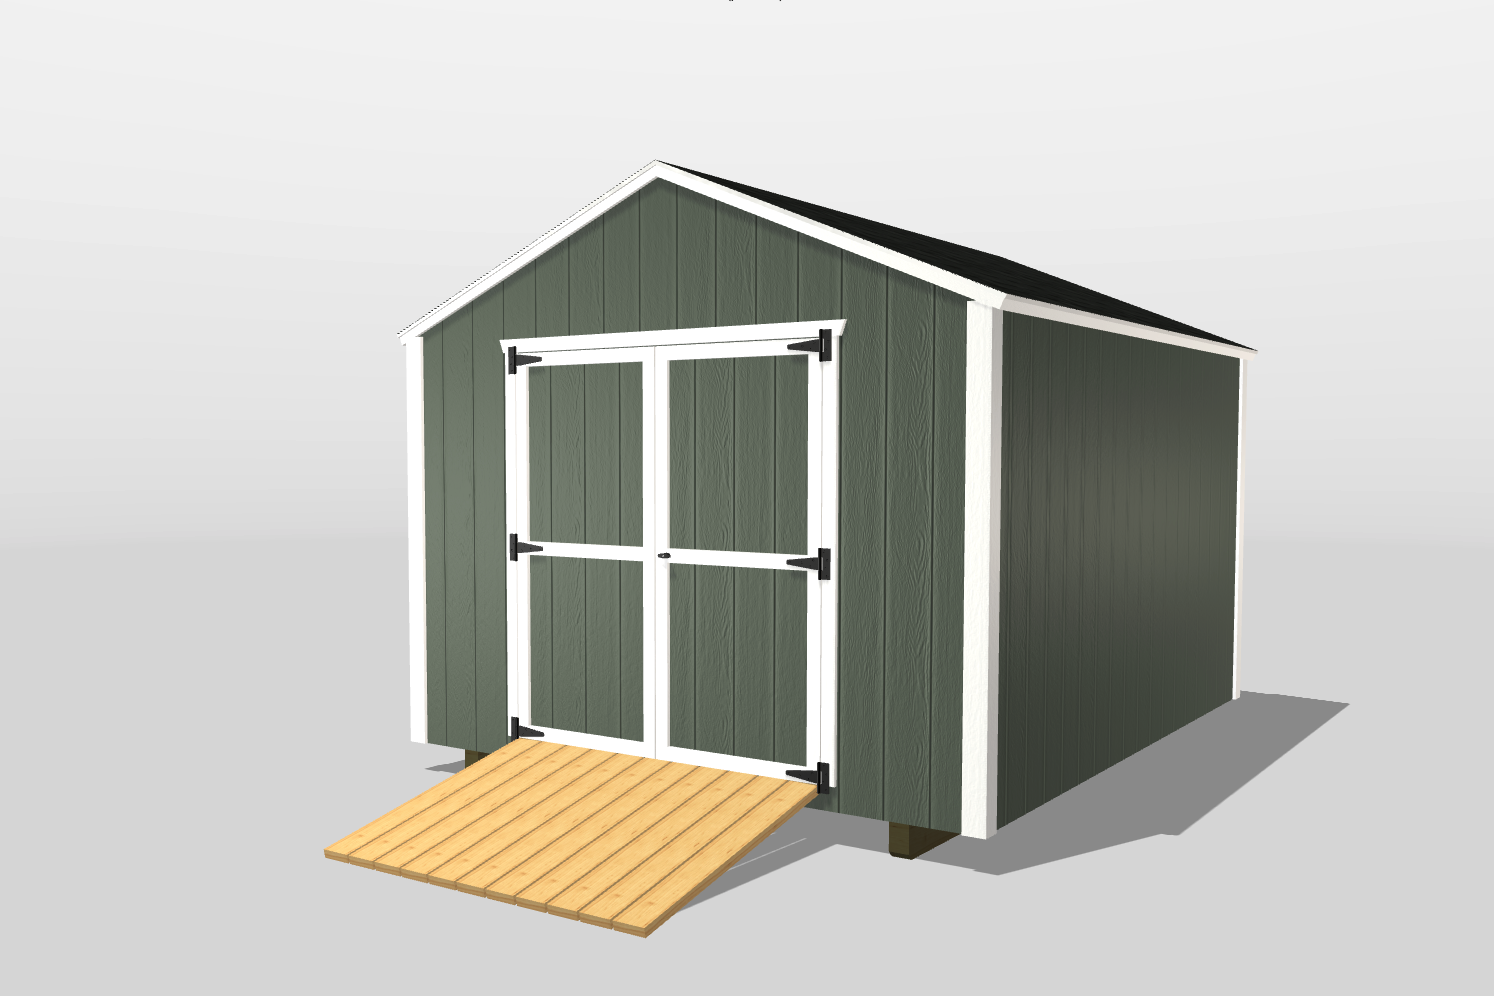 10x12 storage shed vidalia ga